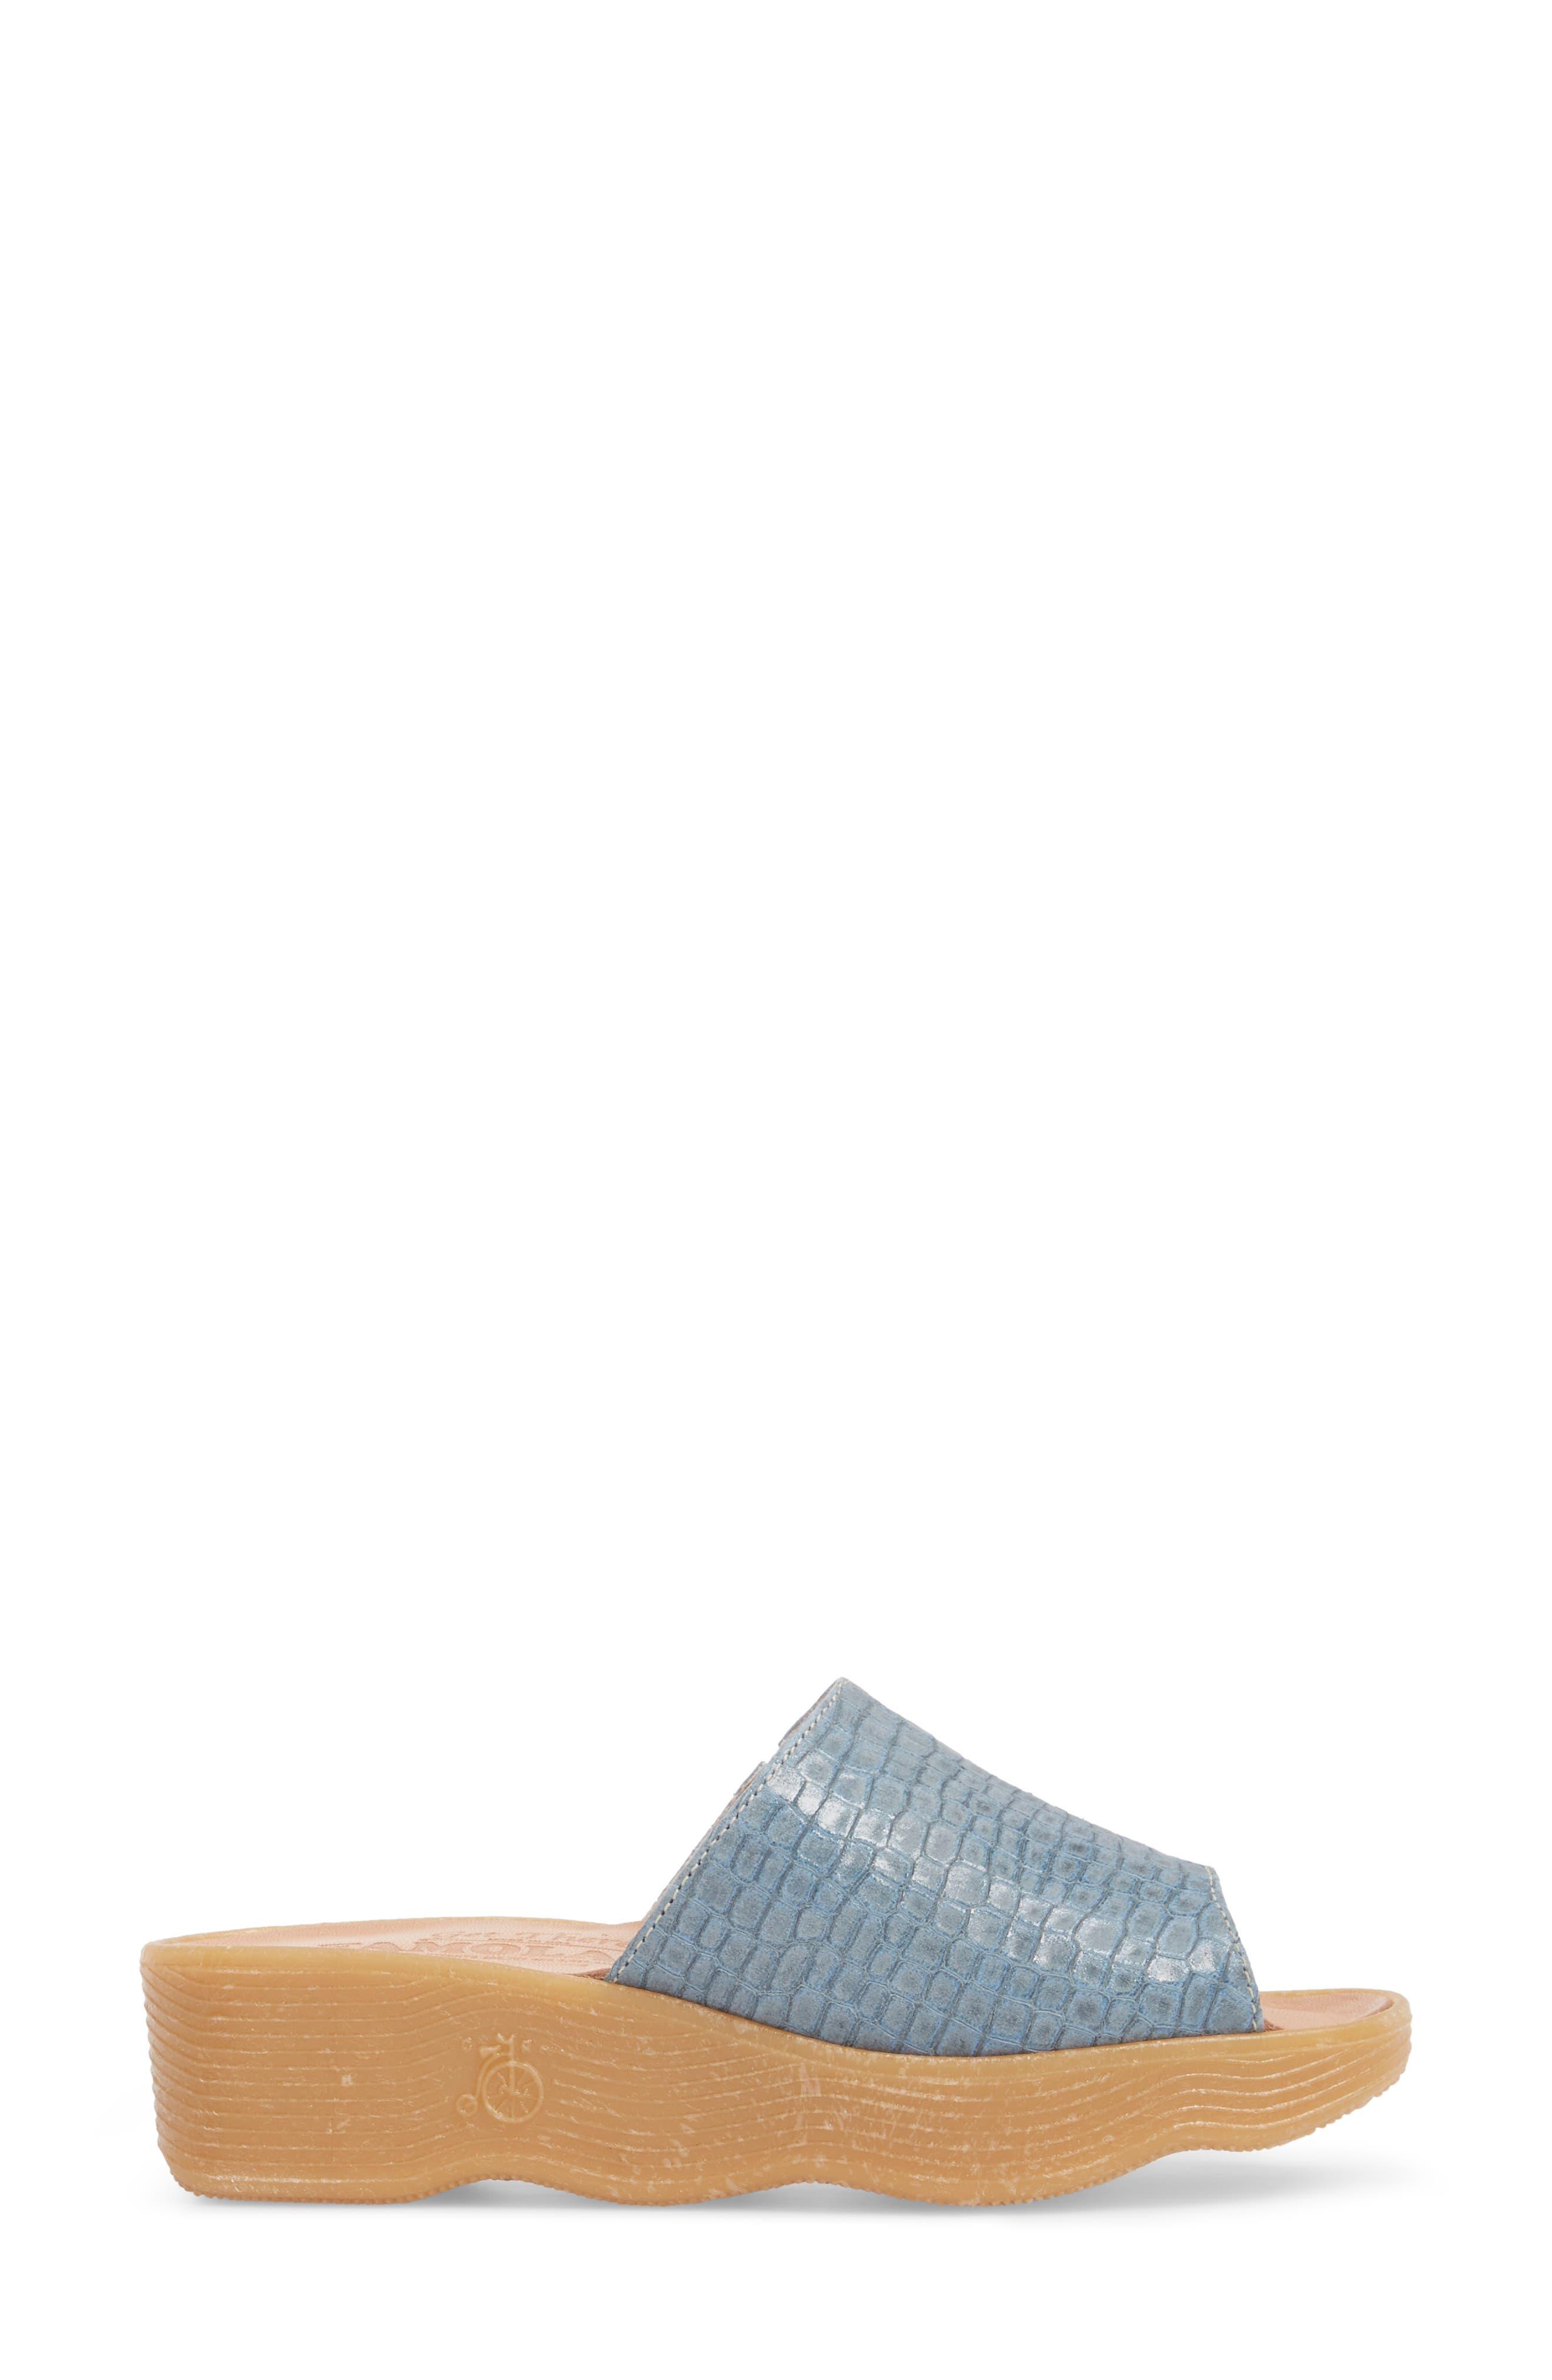 Slide N Sleek Wedge Slide Sandal,                             Alternate thumbnail 3, color,                             Aqua Croc Printed Leather